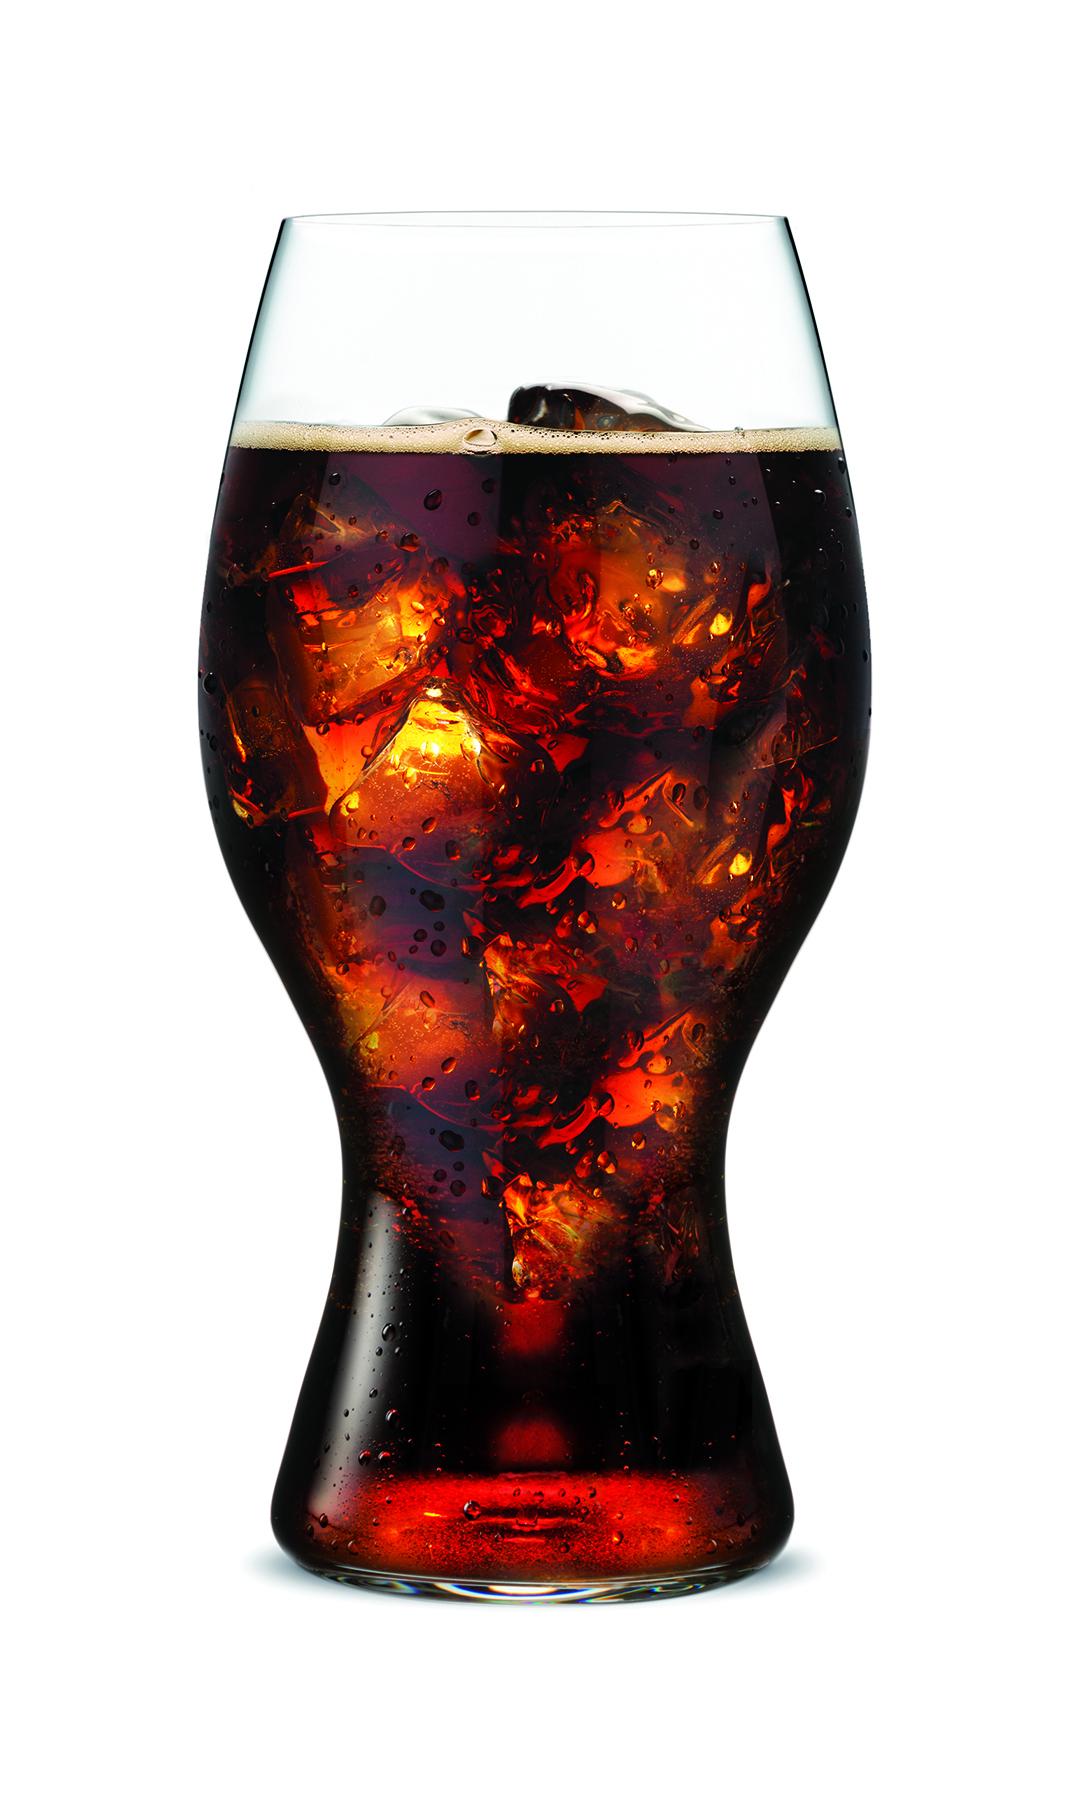 Бокалы Набор бокалов для кока-колы 2шт 480мл Riedel The O Wine Tumbler Coca-Cola Glass bokal-dlya-koka-koly-480ml-riedel-the-o-wine-tumbler-coca-cola-glass-avstriya.jpg